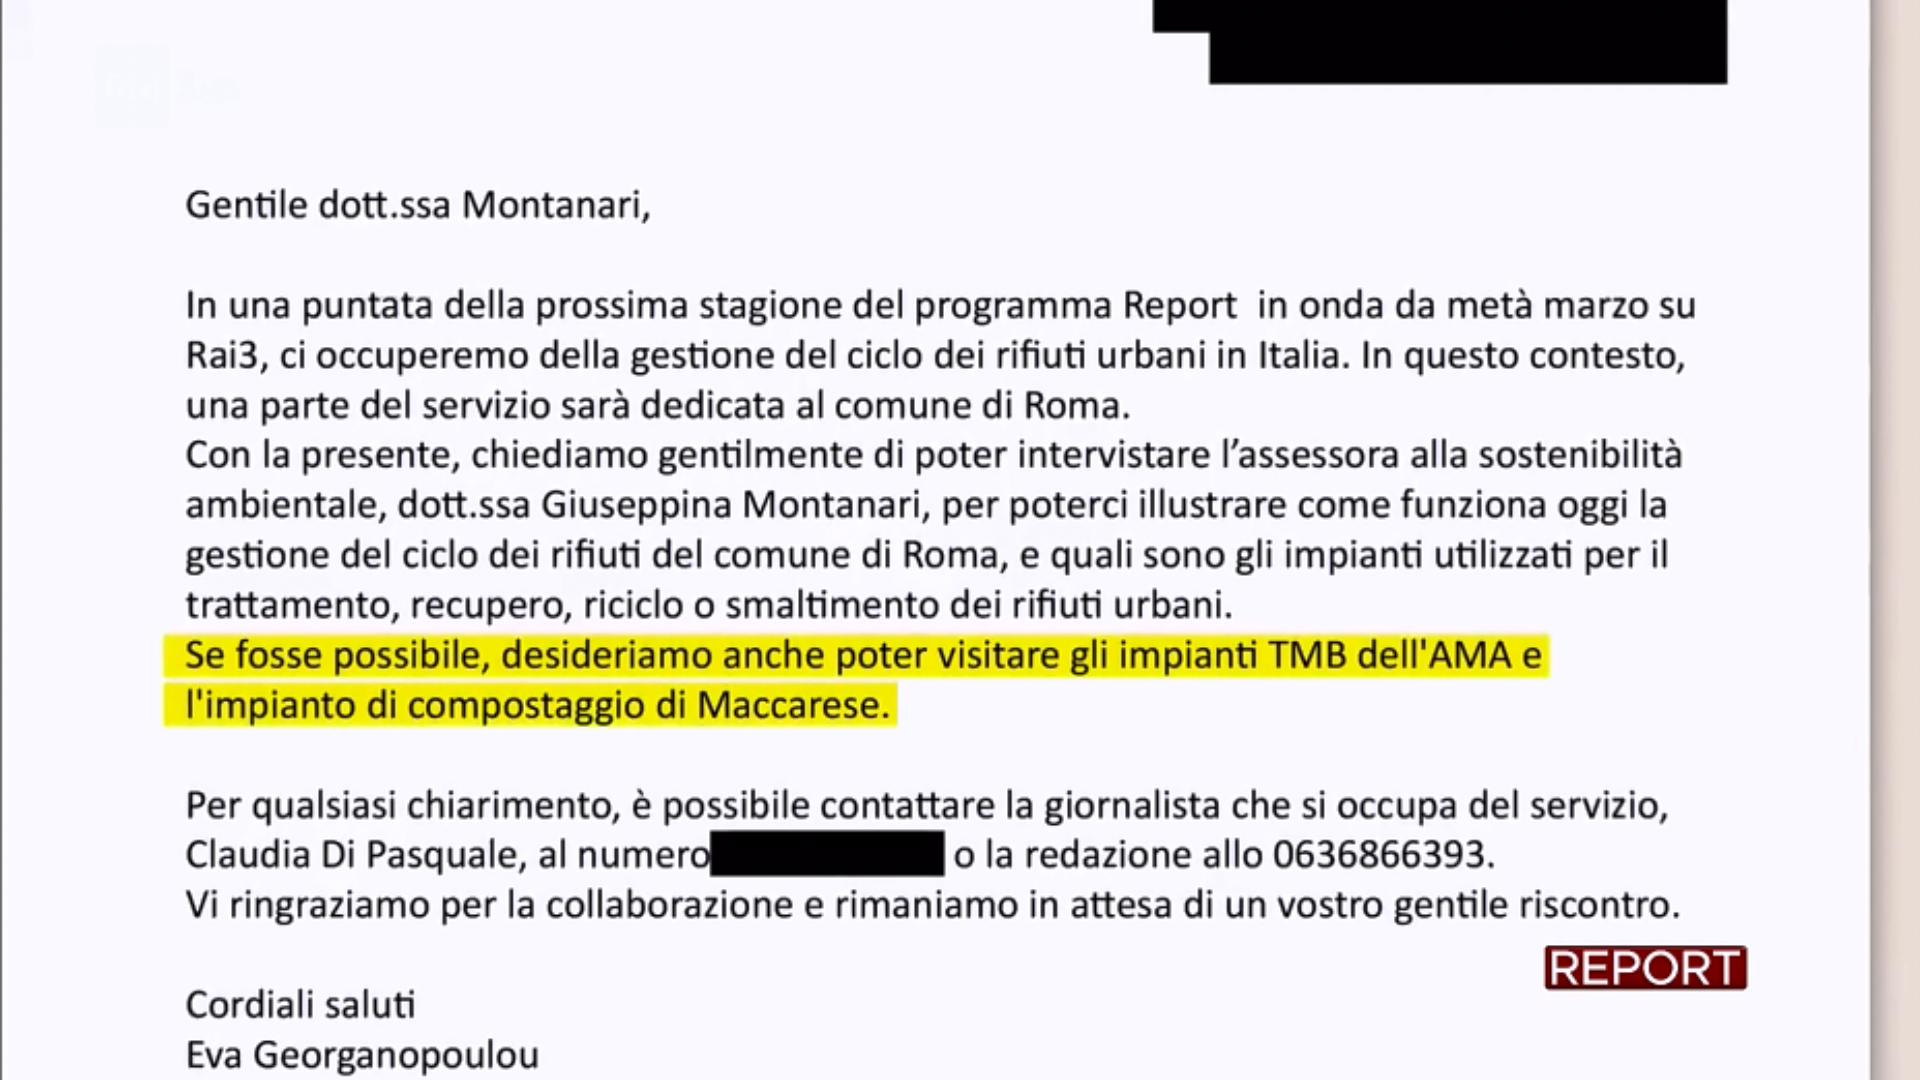 rifiuti roma report montanari richiesta visita nuovo salario rocca cencia - 2